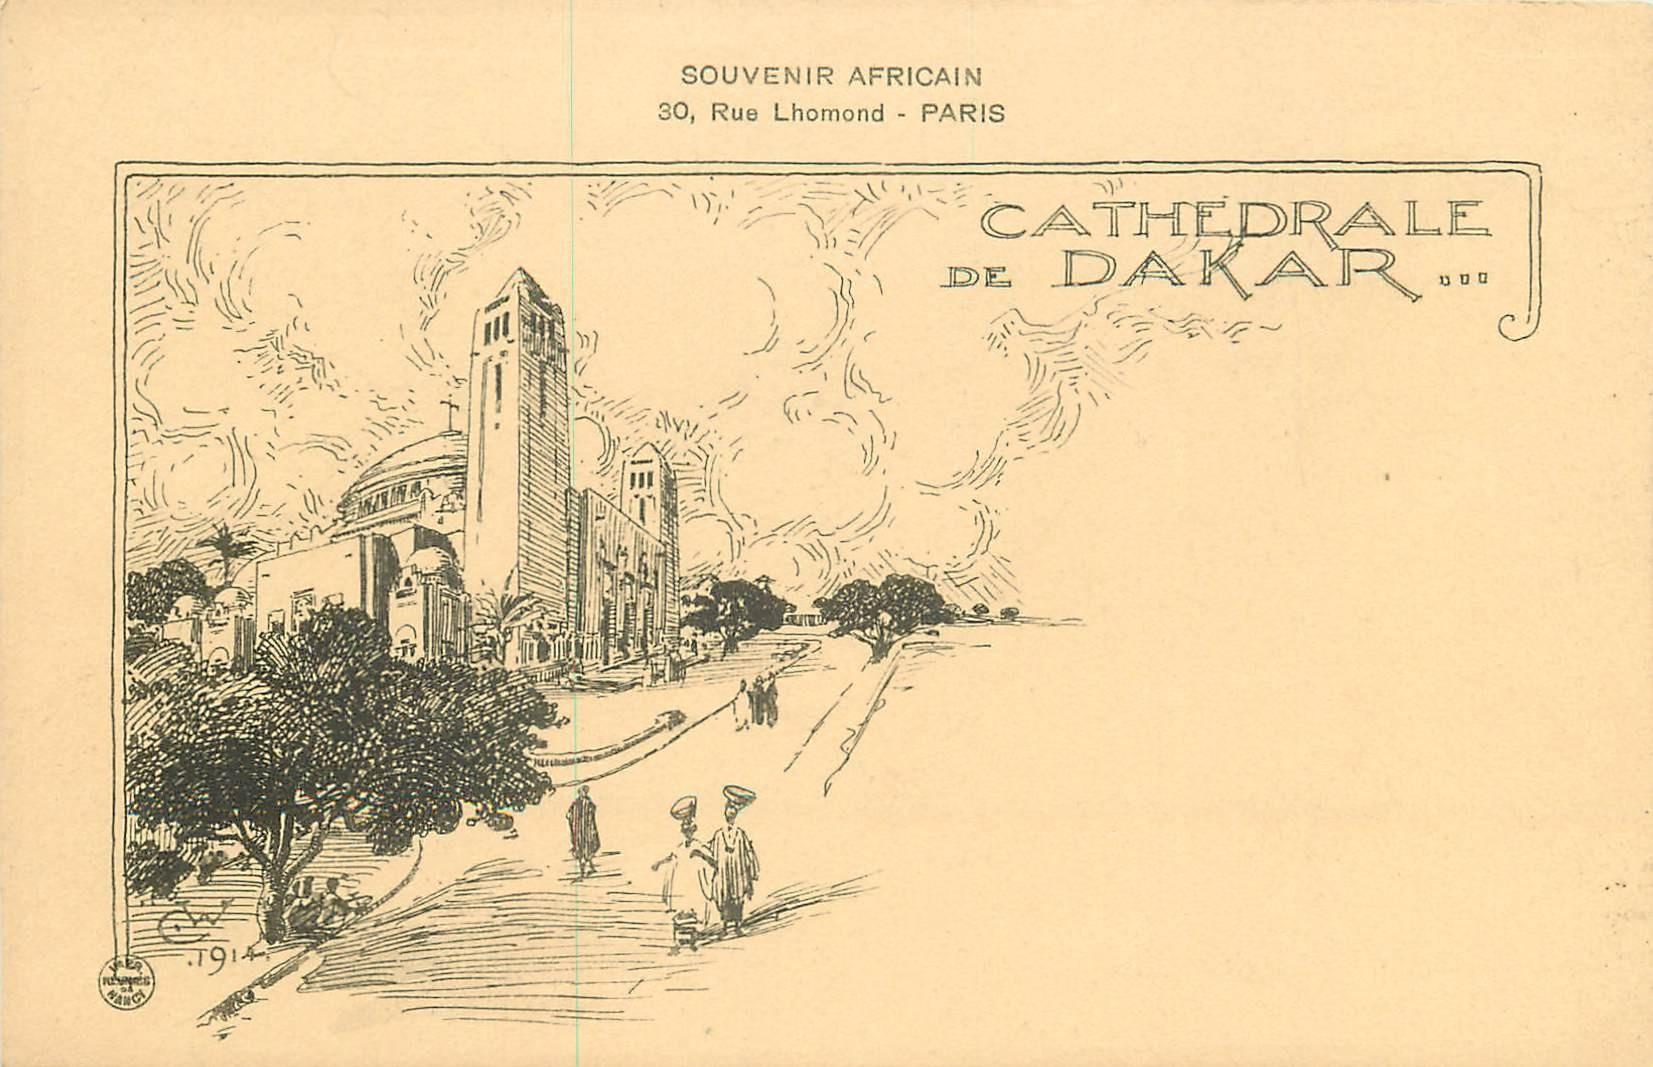 SENEGAL. Cathédrale de Dakar dessin de 1914